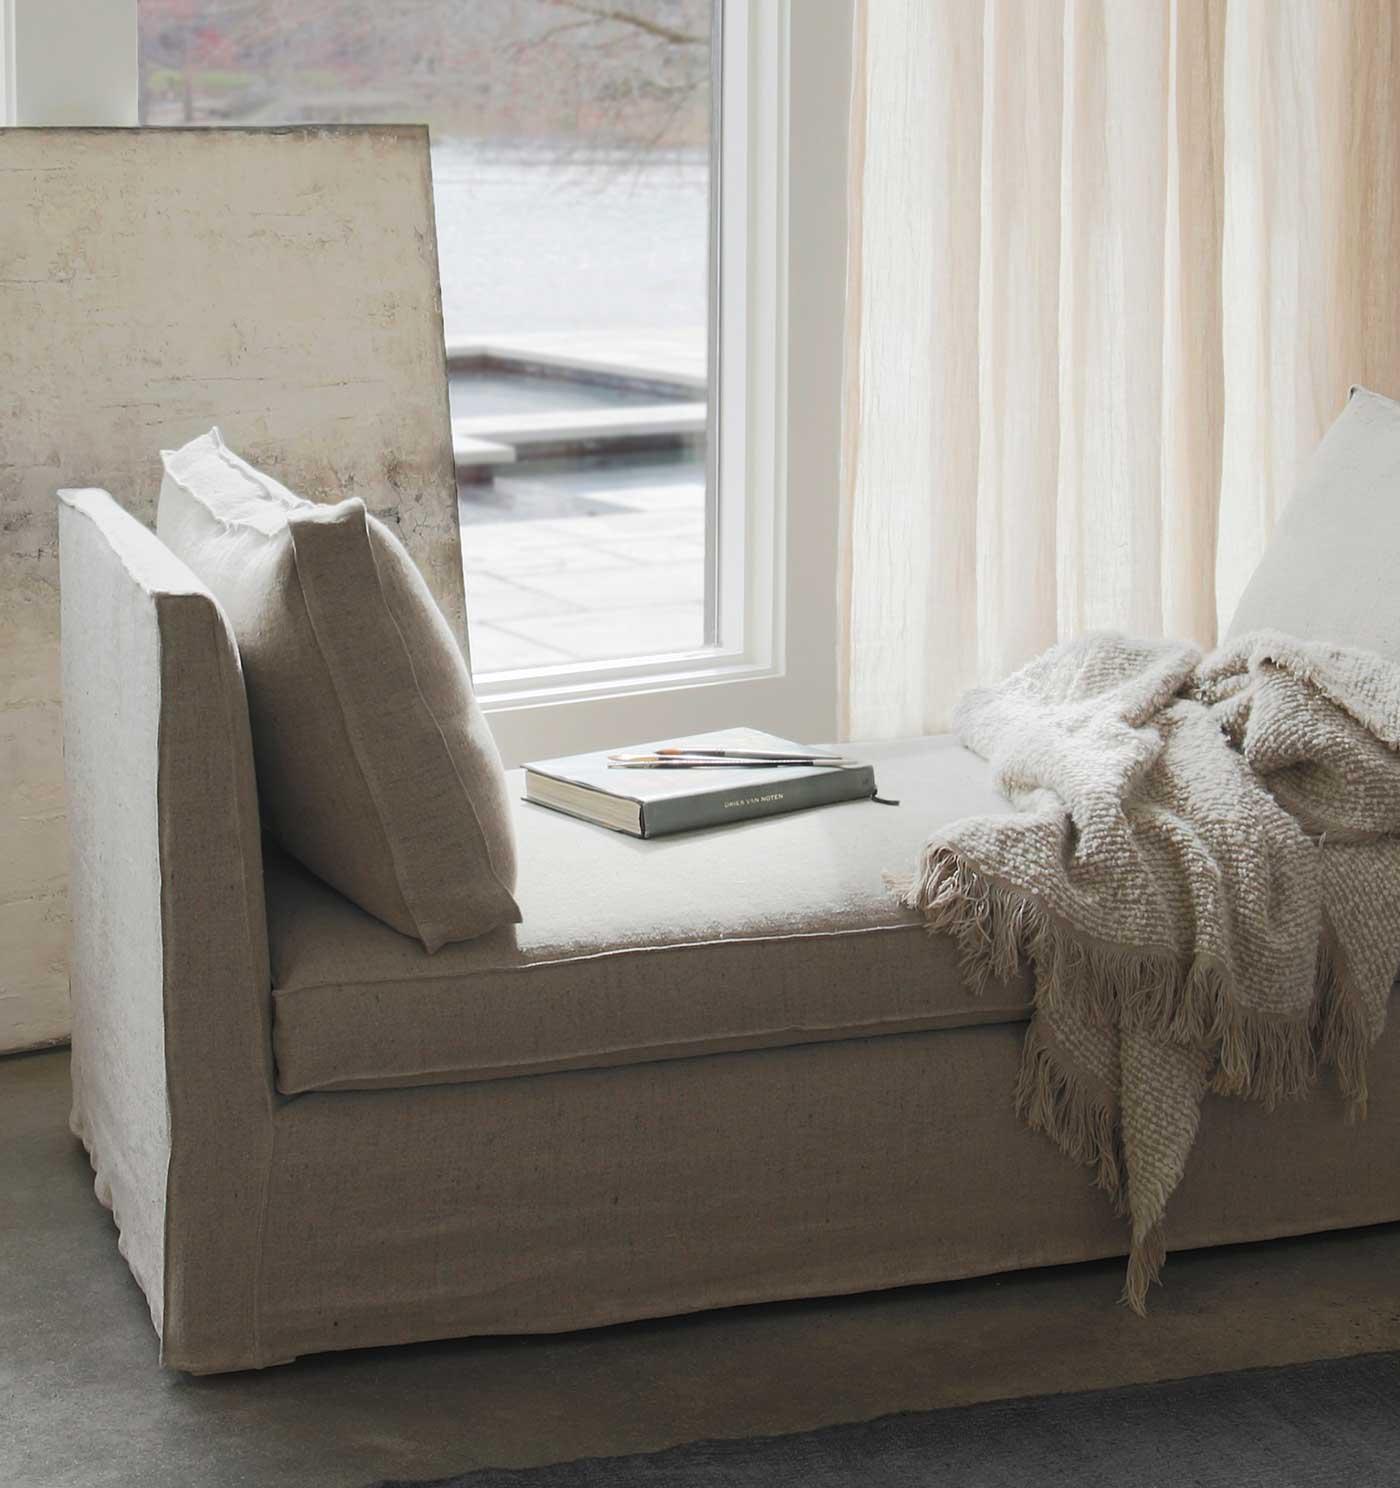 Verellen Furniture at ARTEFACT in Boston